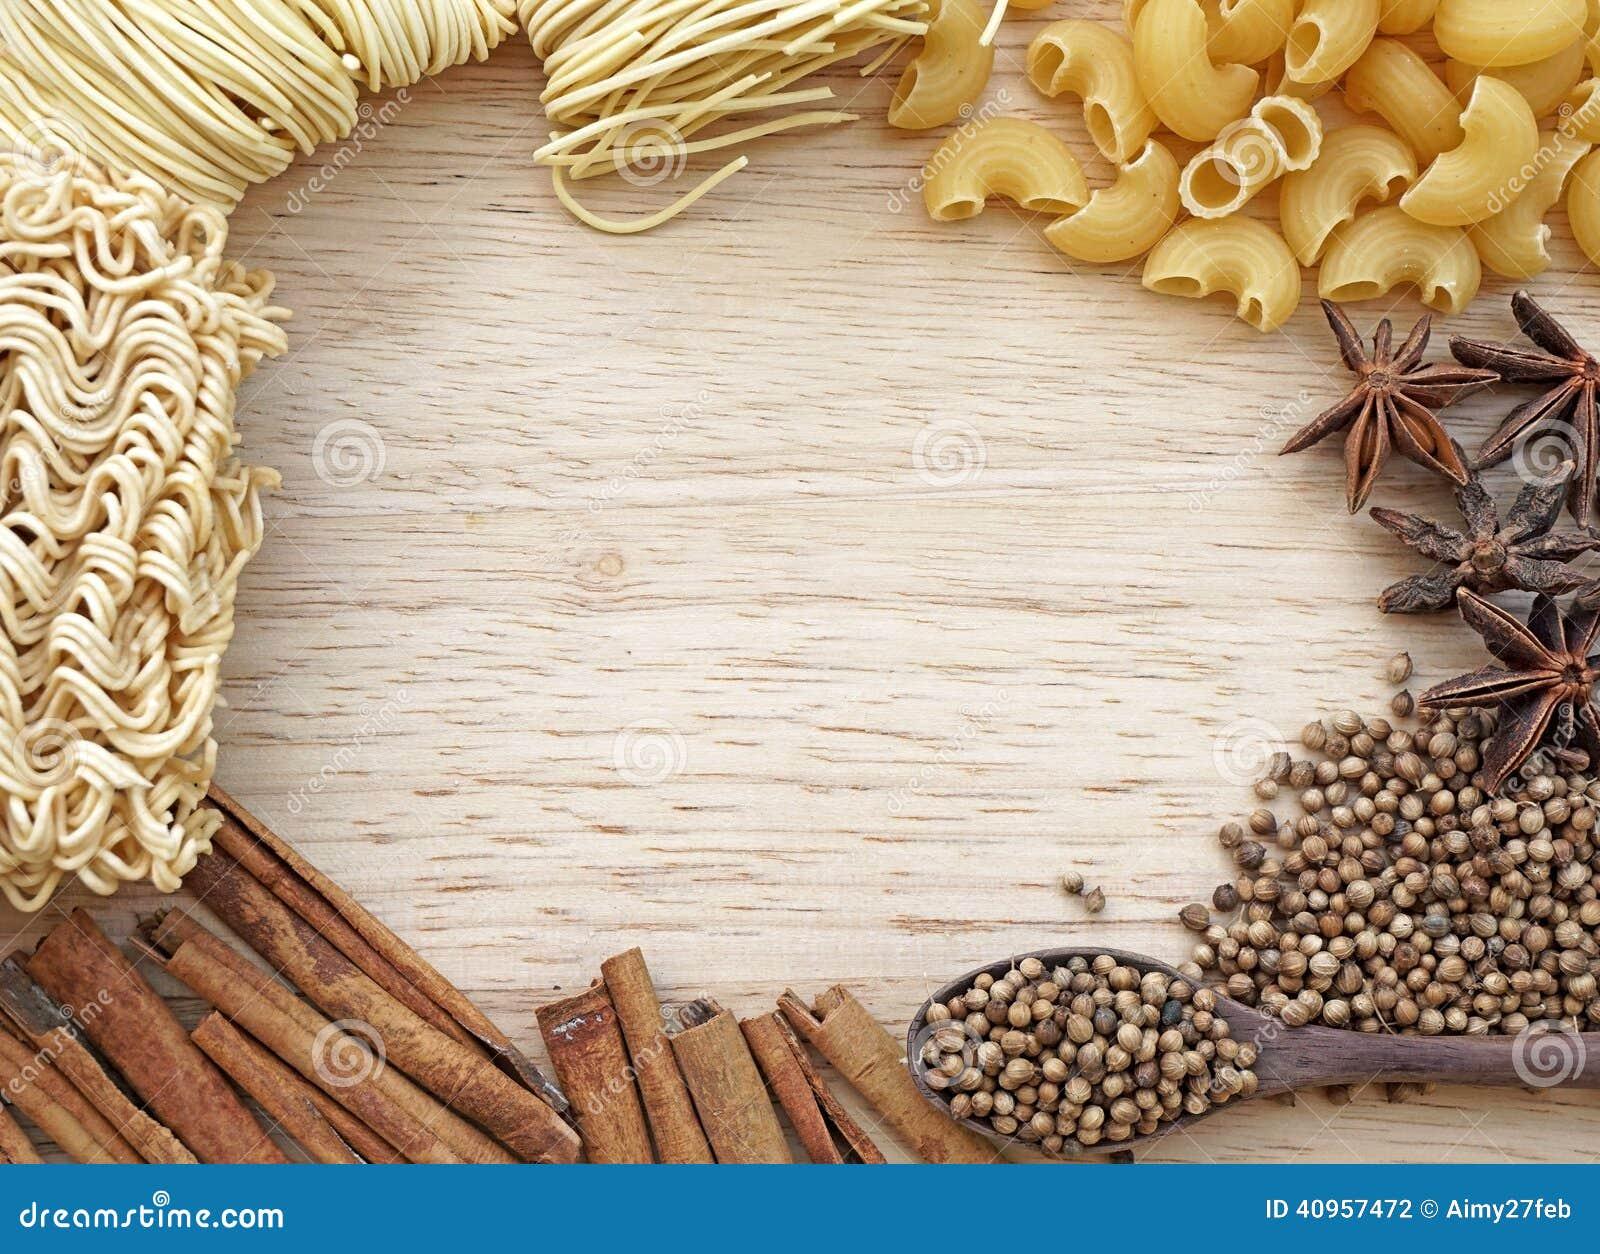 Food frame noodle peppercorn macaroni design on wooden background